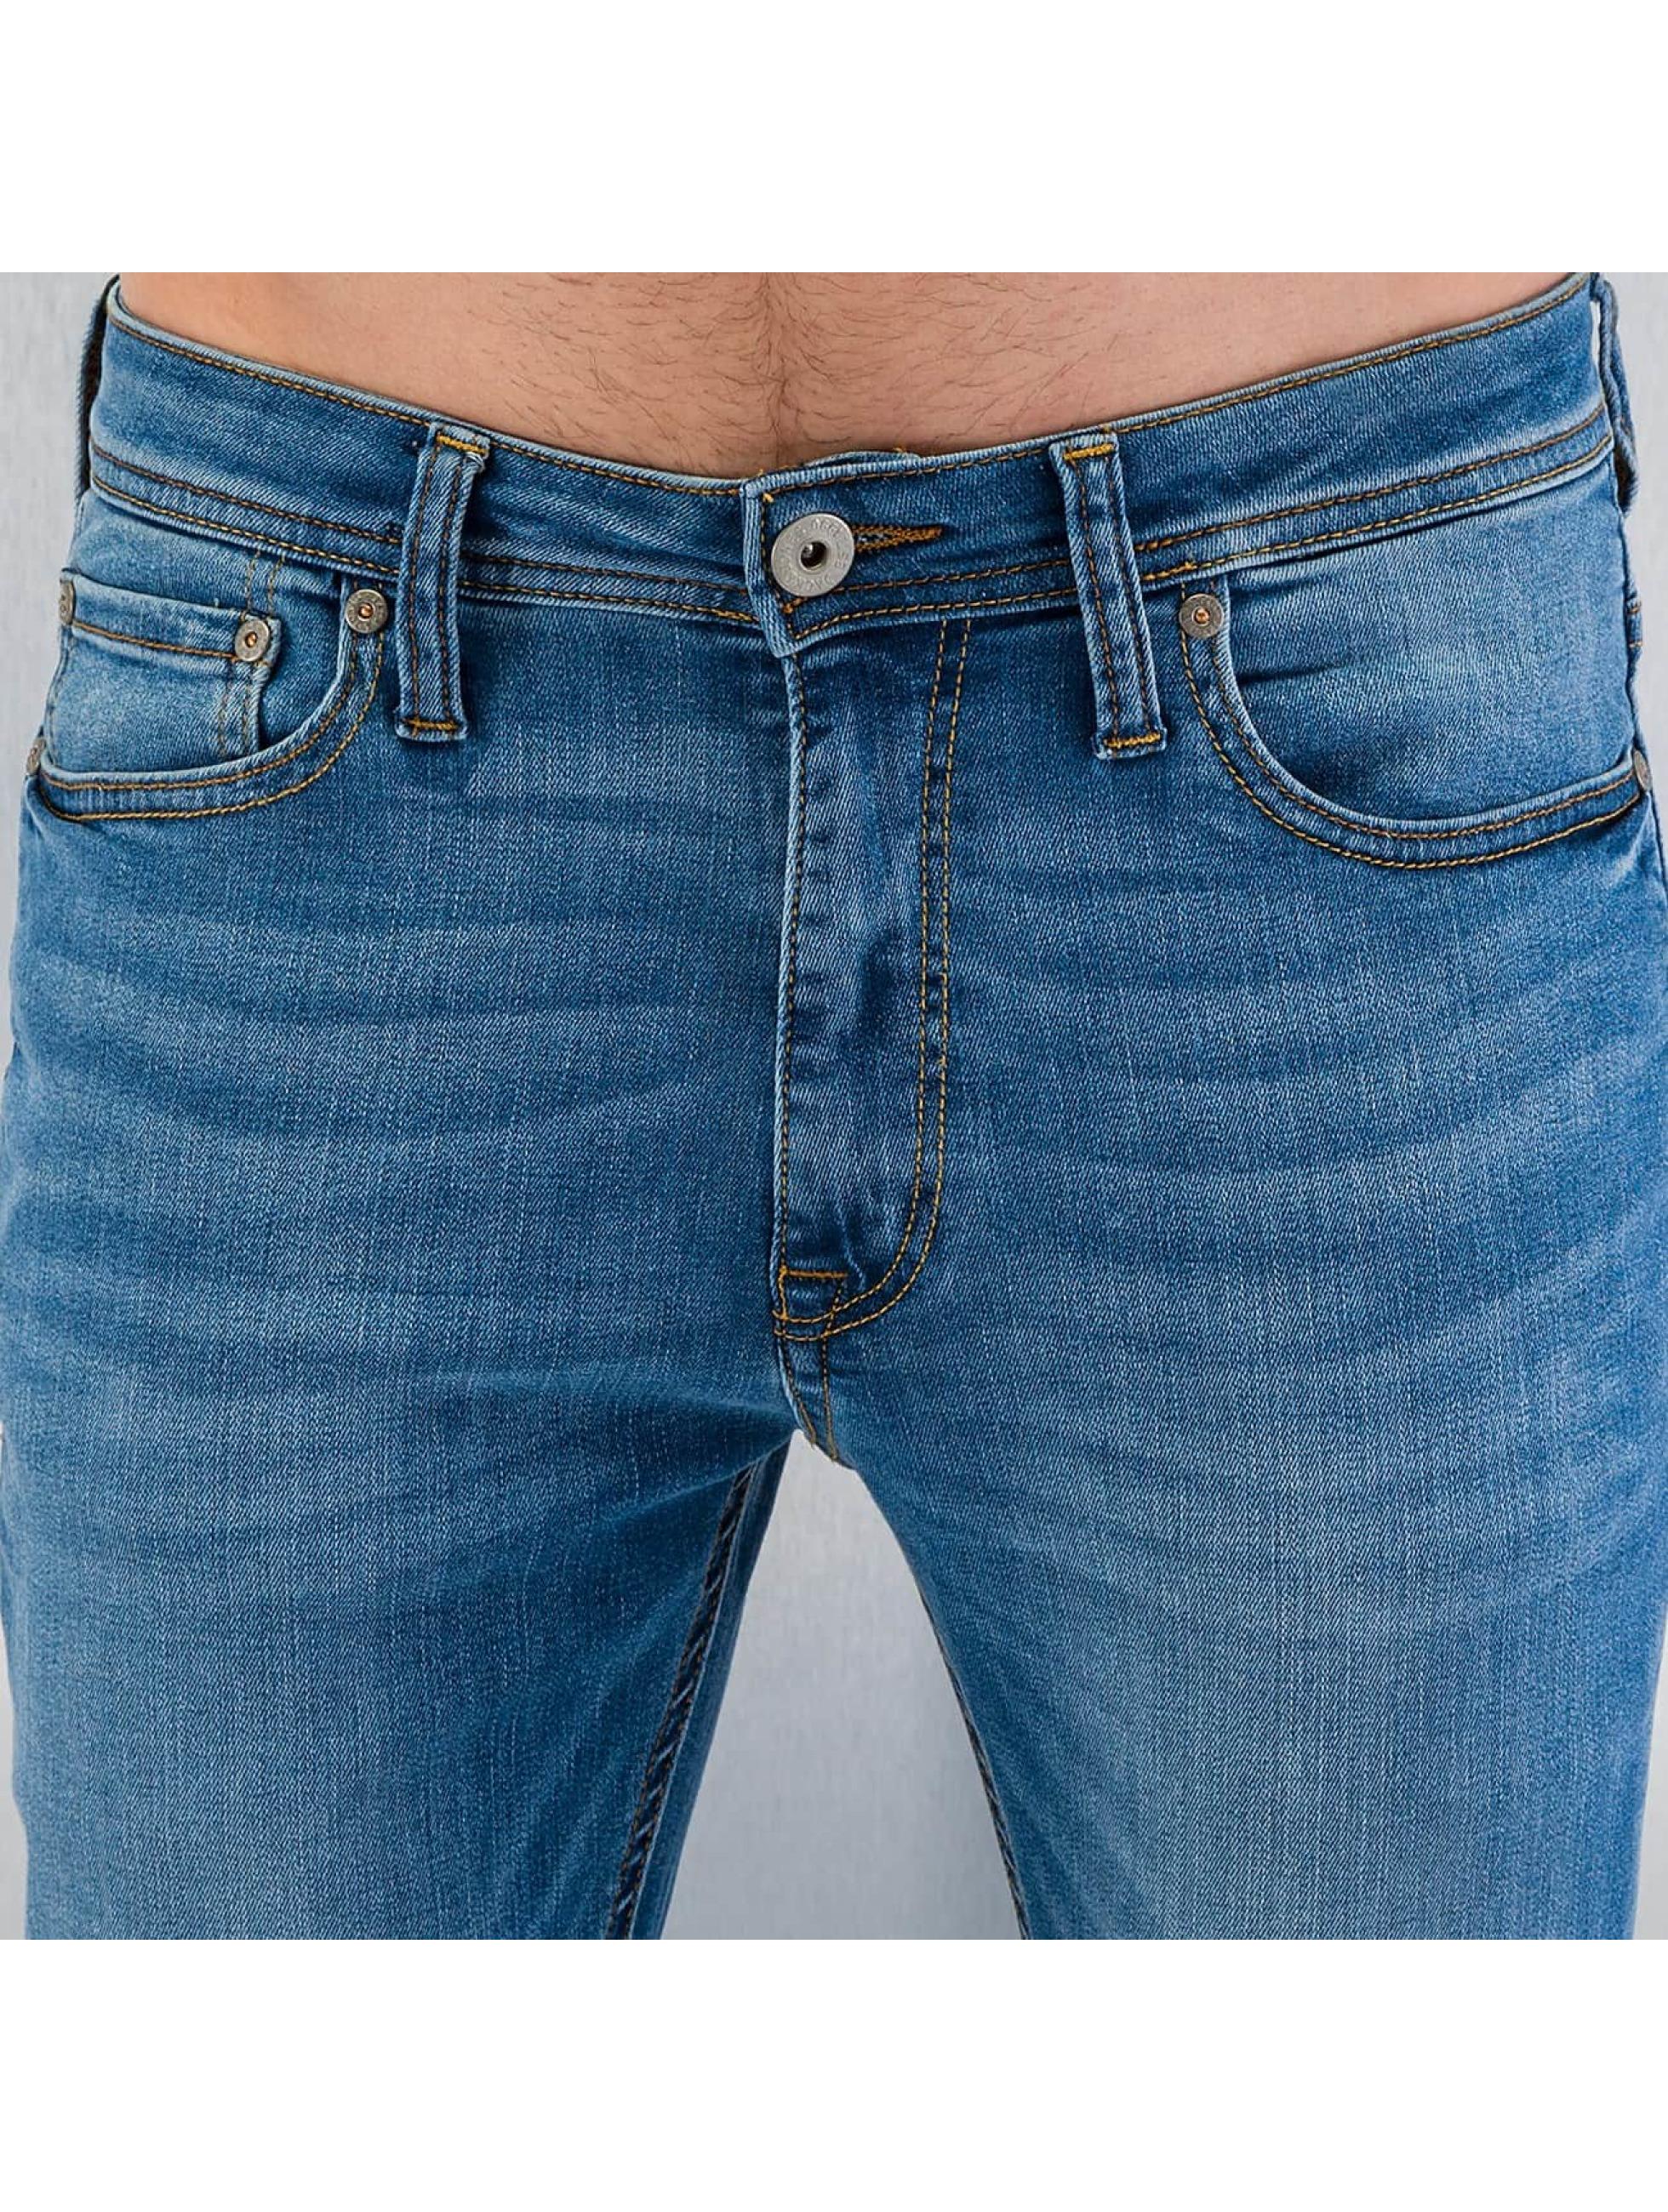 Jack & Jones Skinny Jeans jjiLiam jjOriginal niebieski